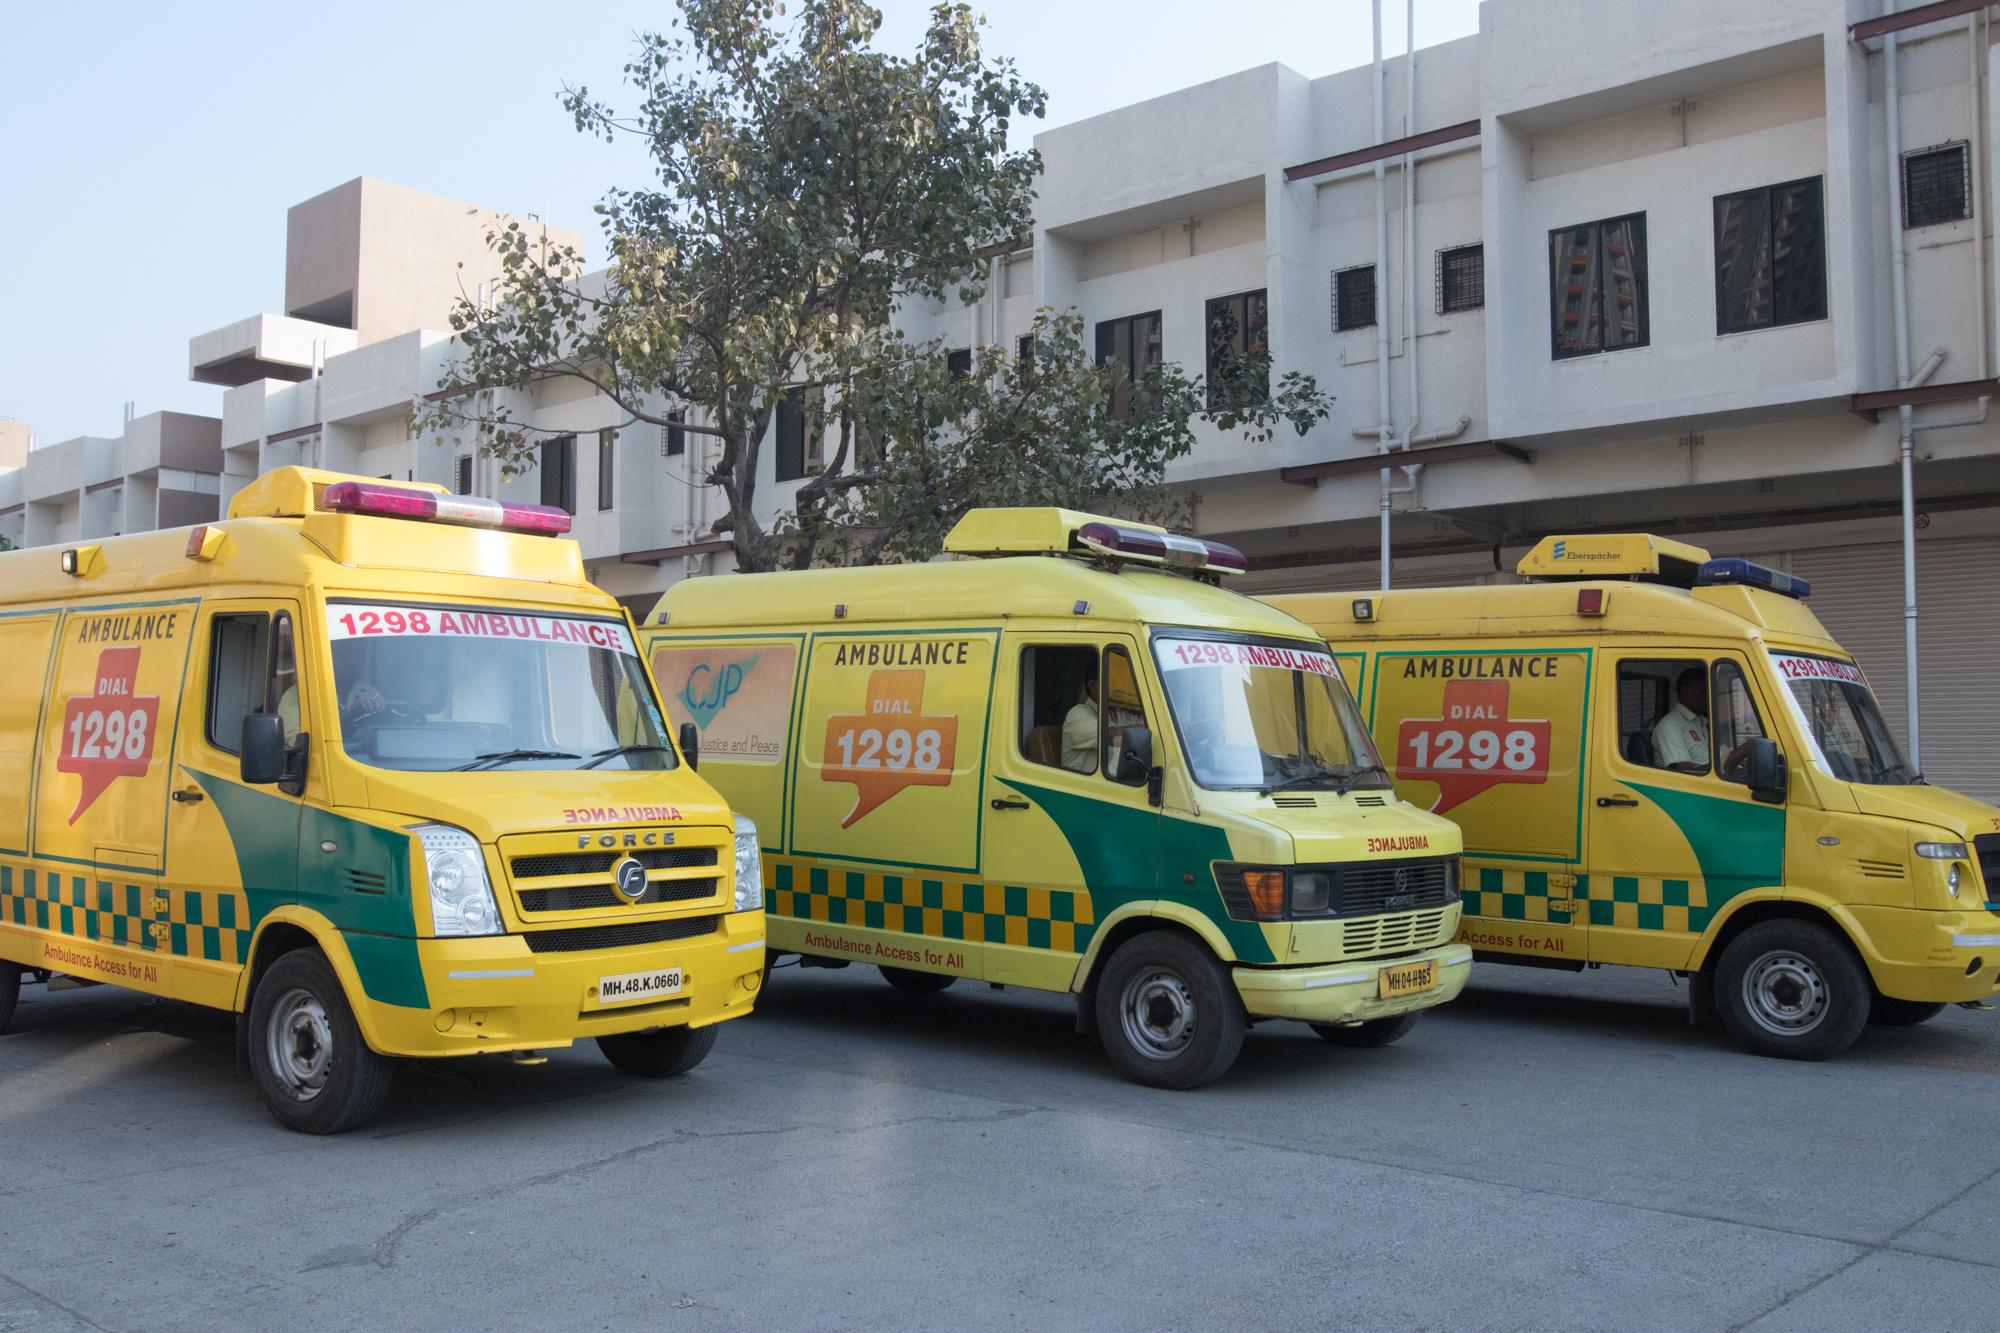 Ambulances of Ziquitza parked near a hospital